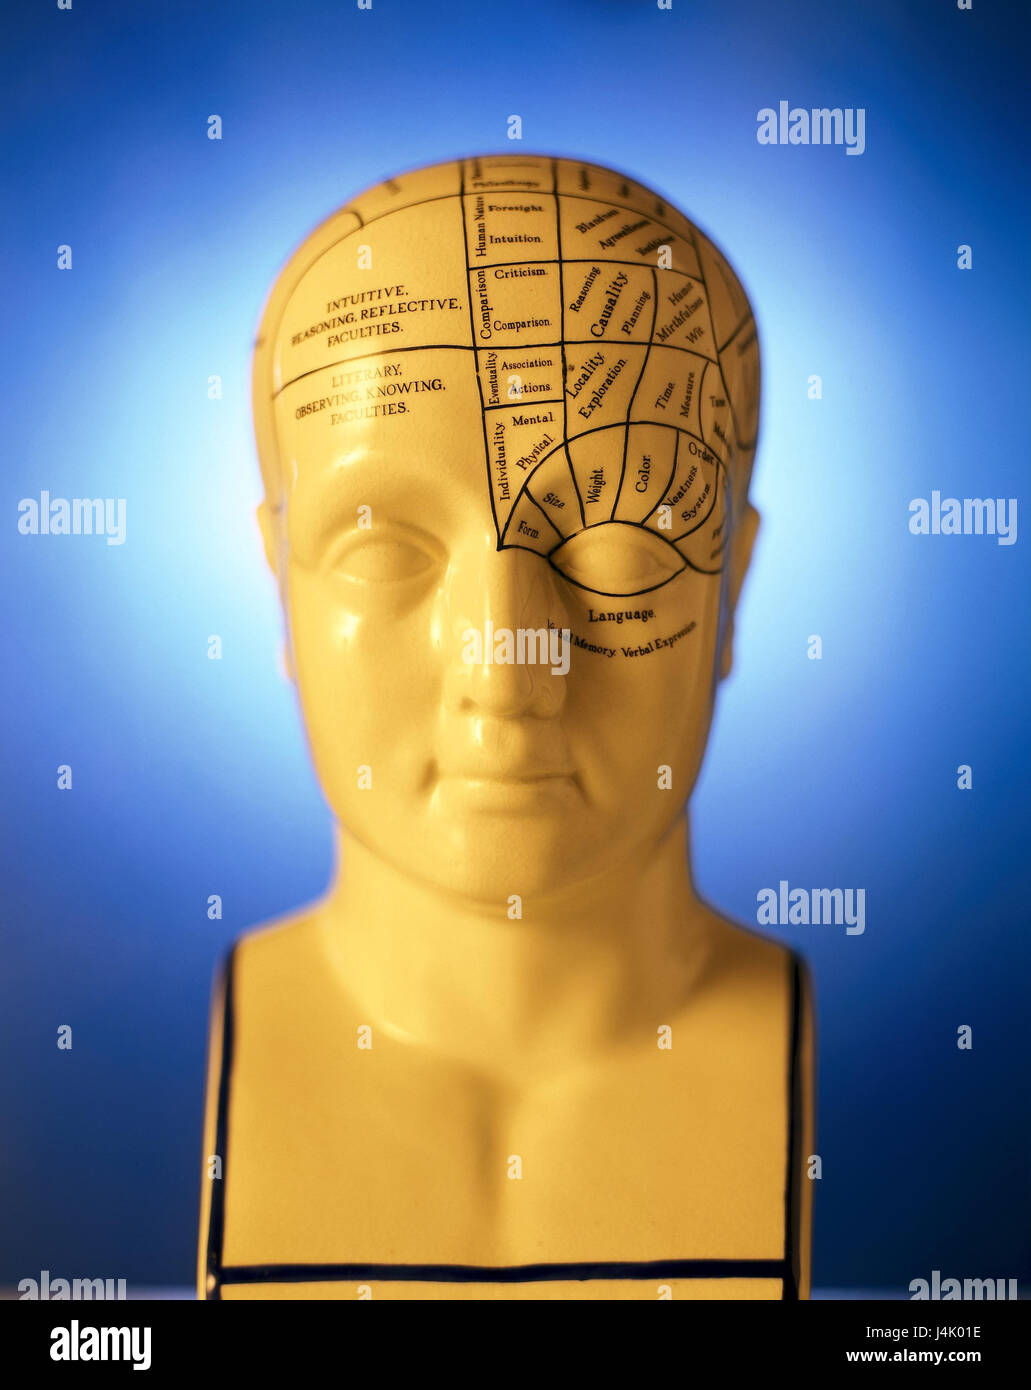 Medicine, model head, marks, brain functions medicine, science, head, model, show model, teaching model, head model, - Stock Image